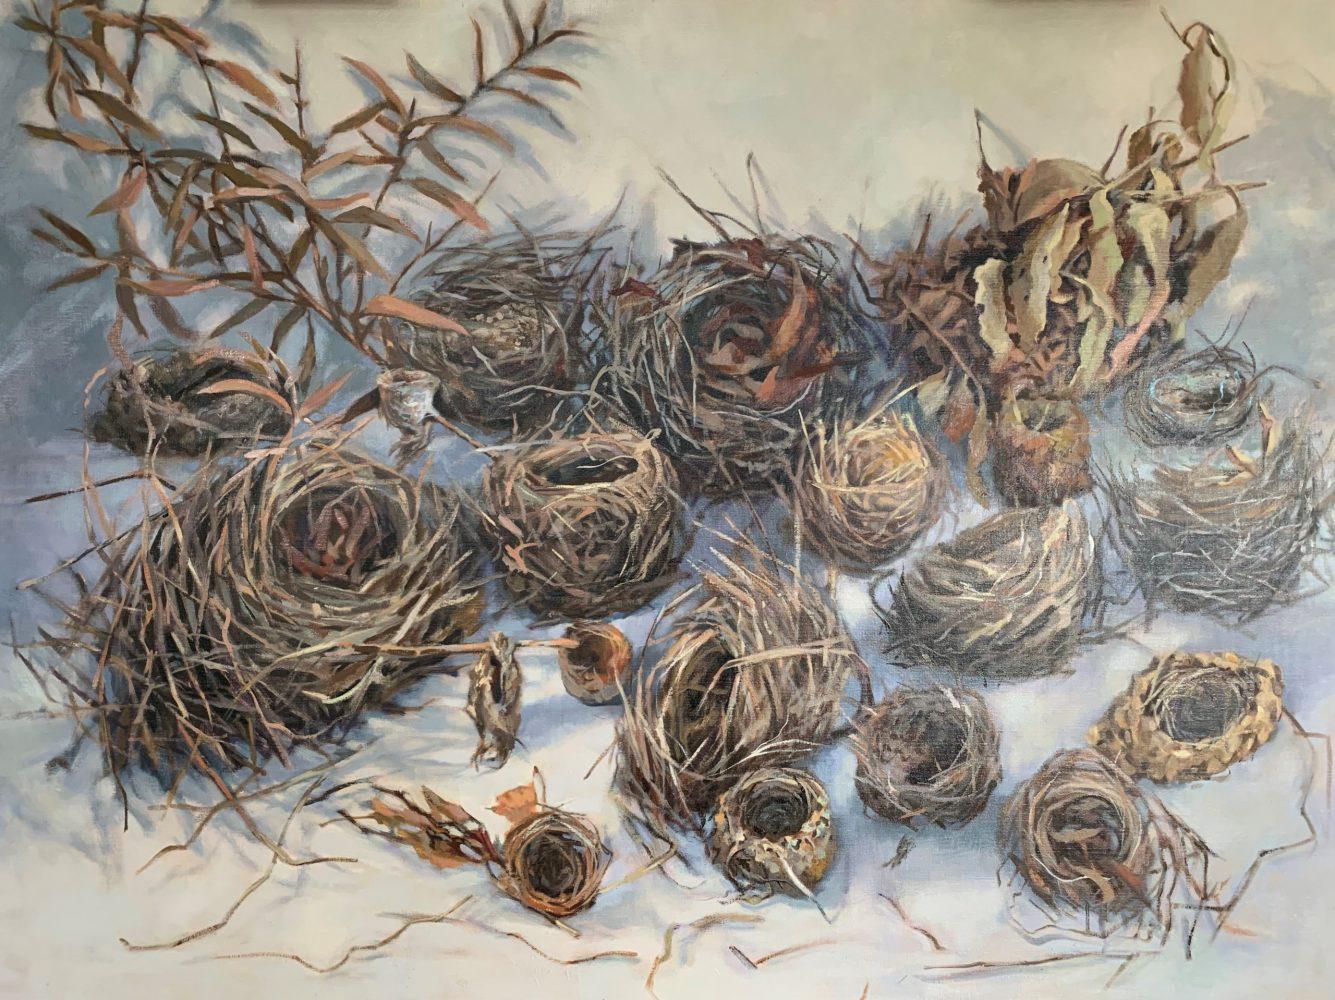 20 Nests Habitat 100